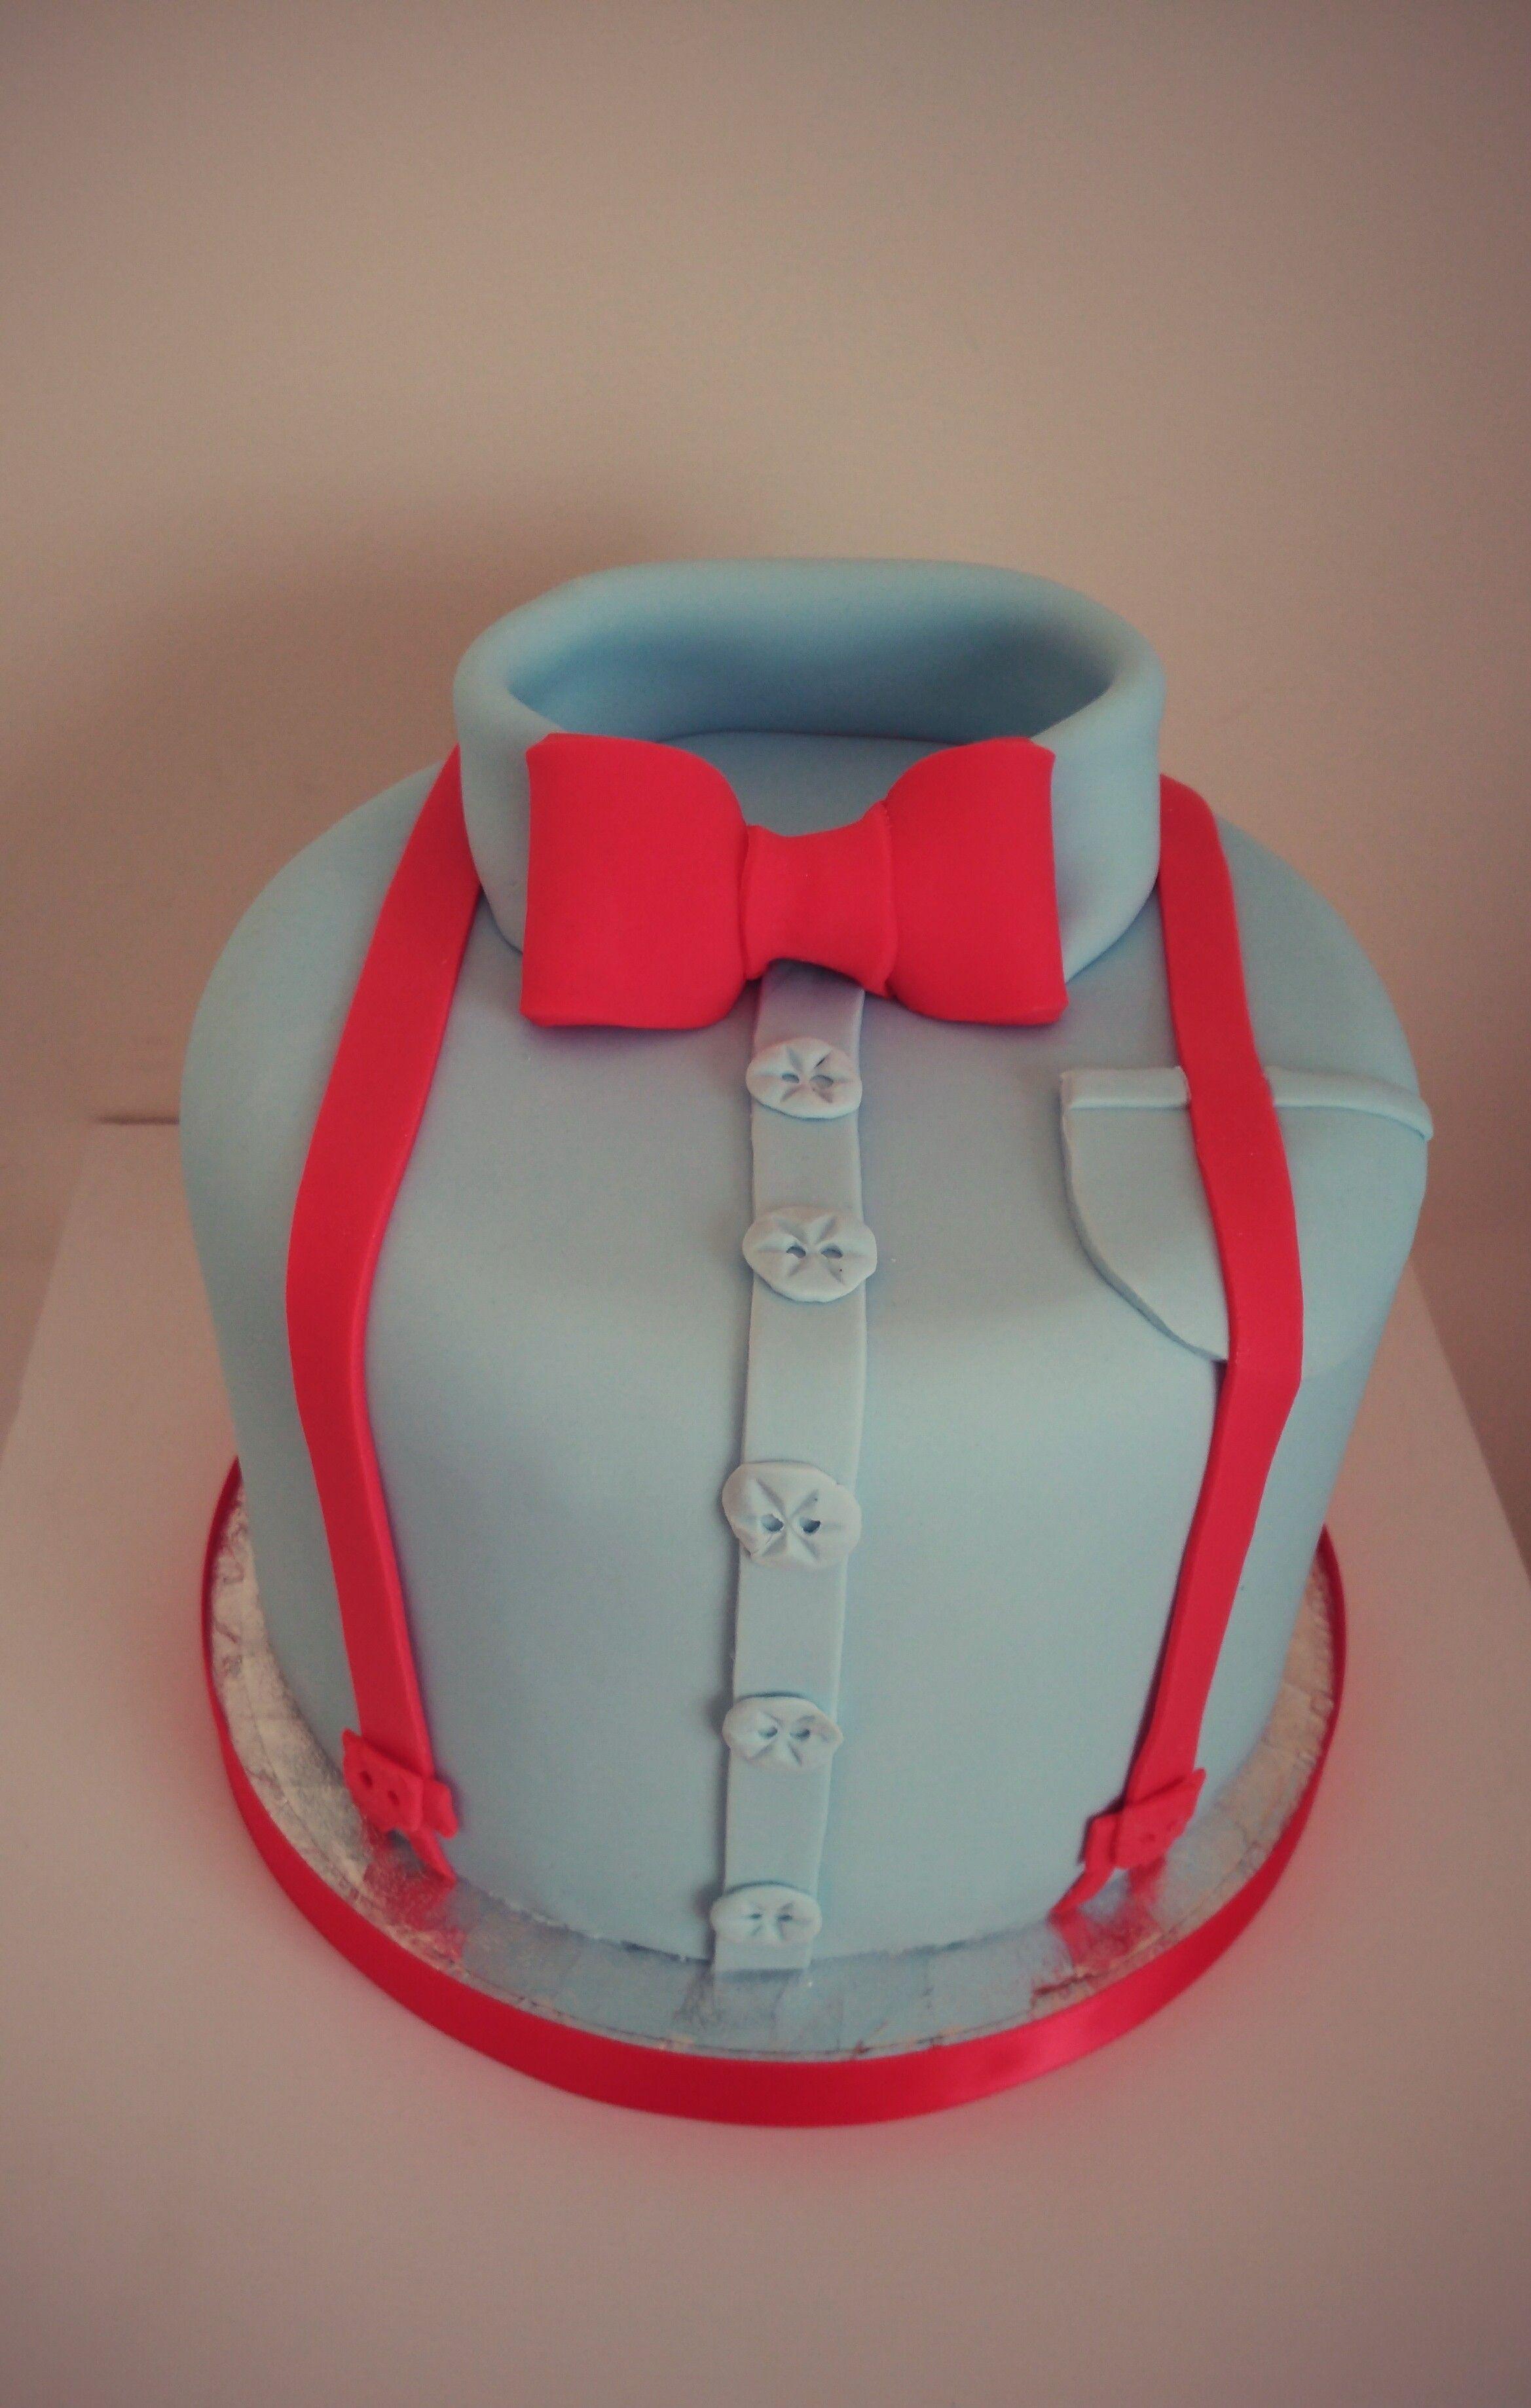 Shirt And Tie Cake Cakeart Shirts Shoes Dresses Pinterest